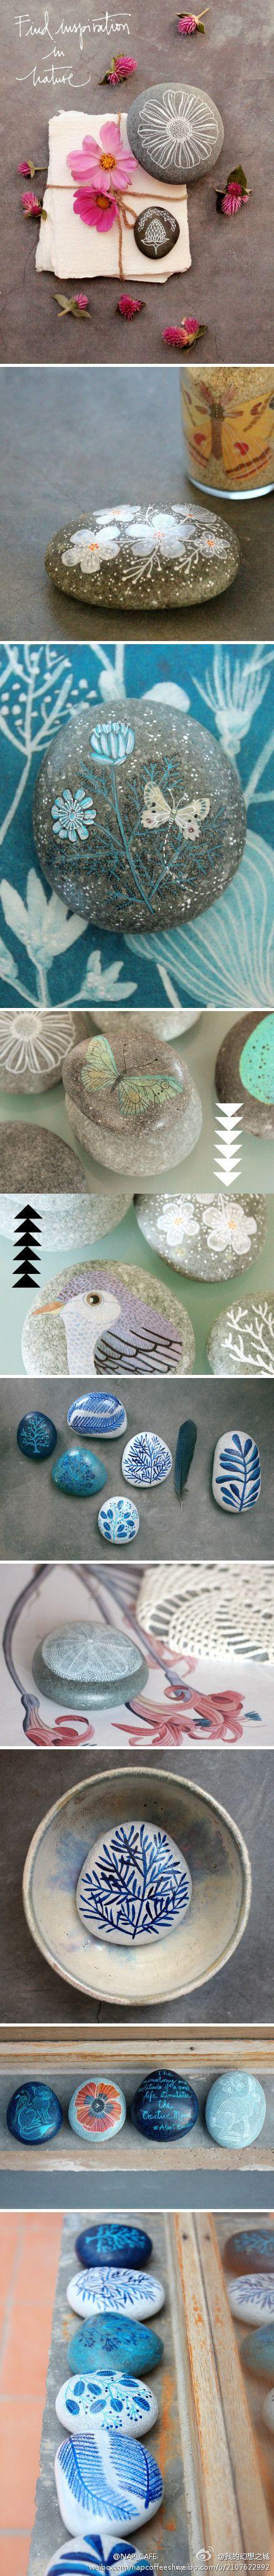 hand painting stones #crafts